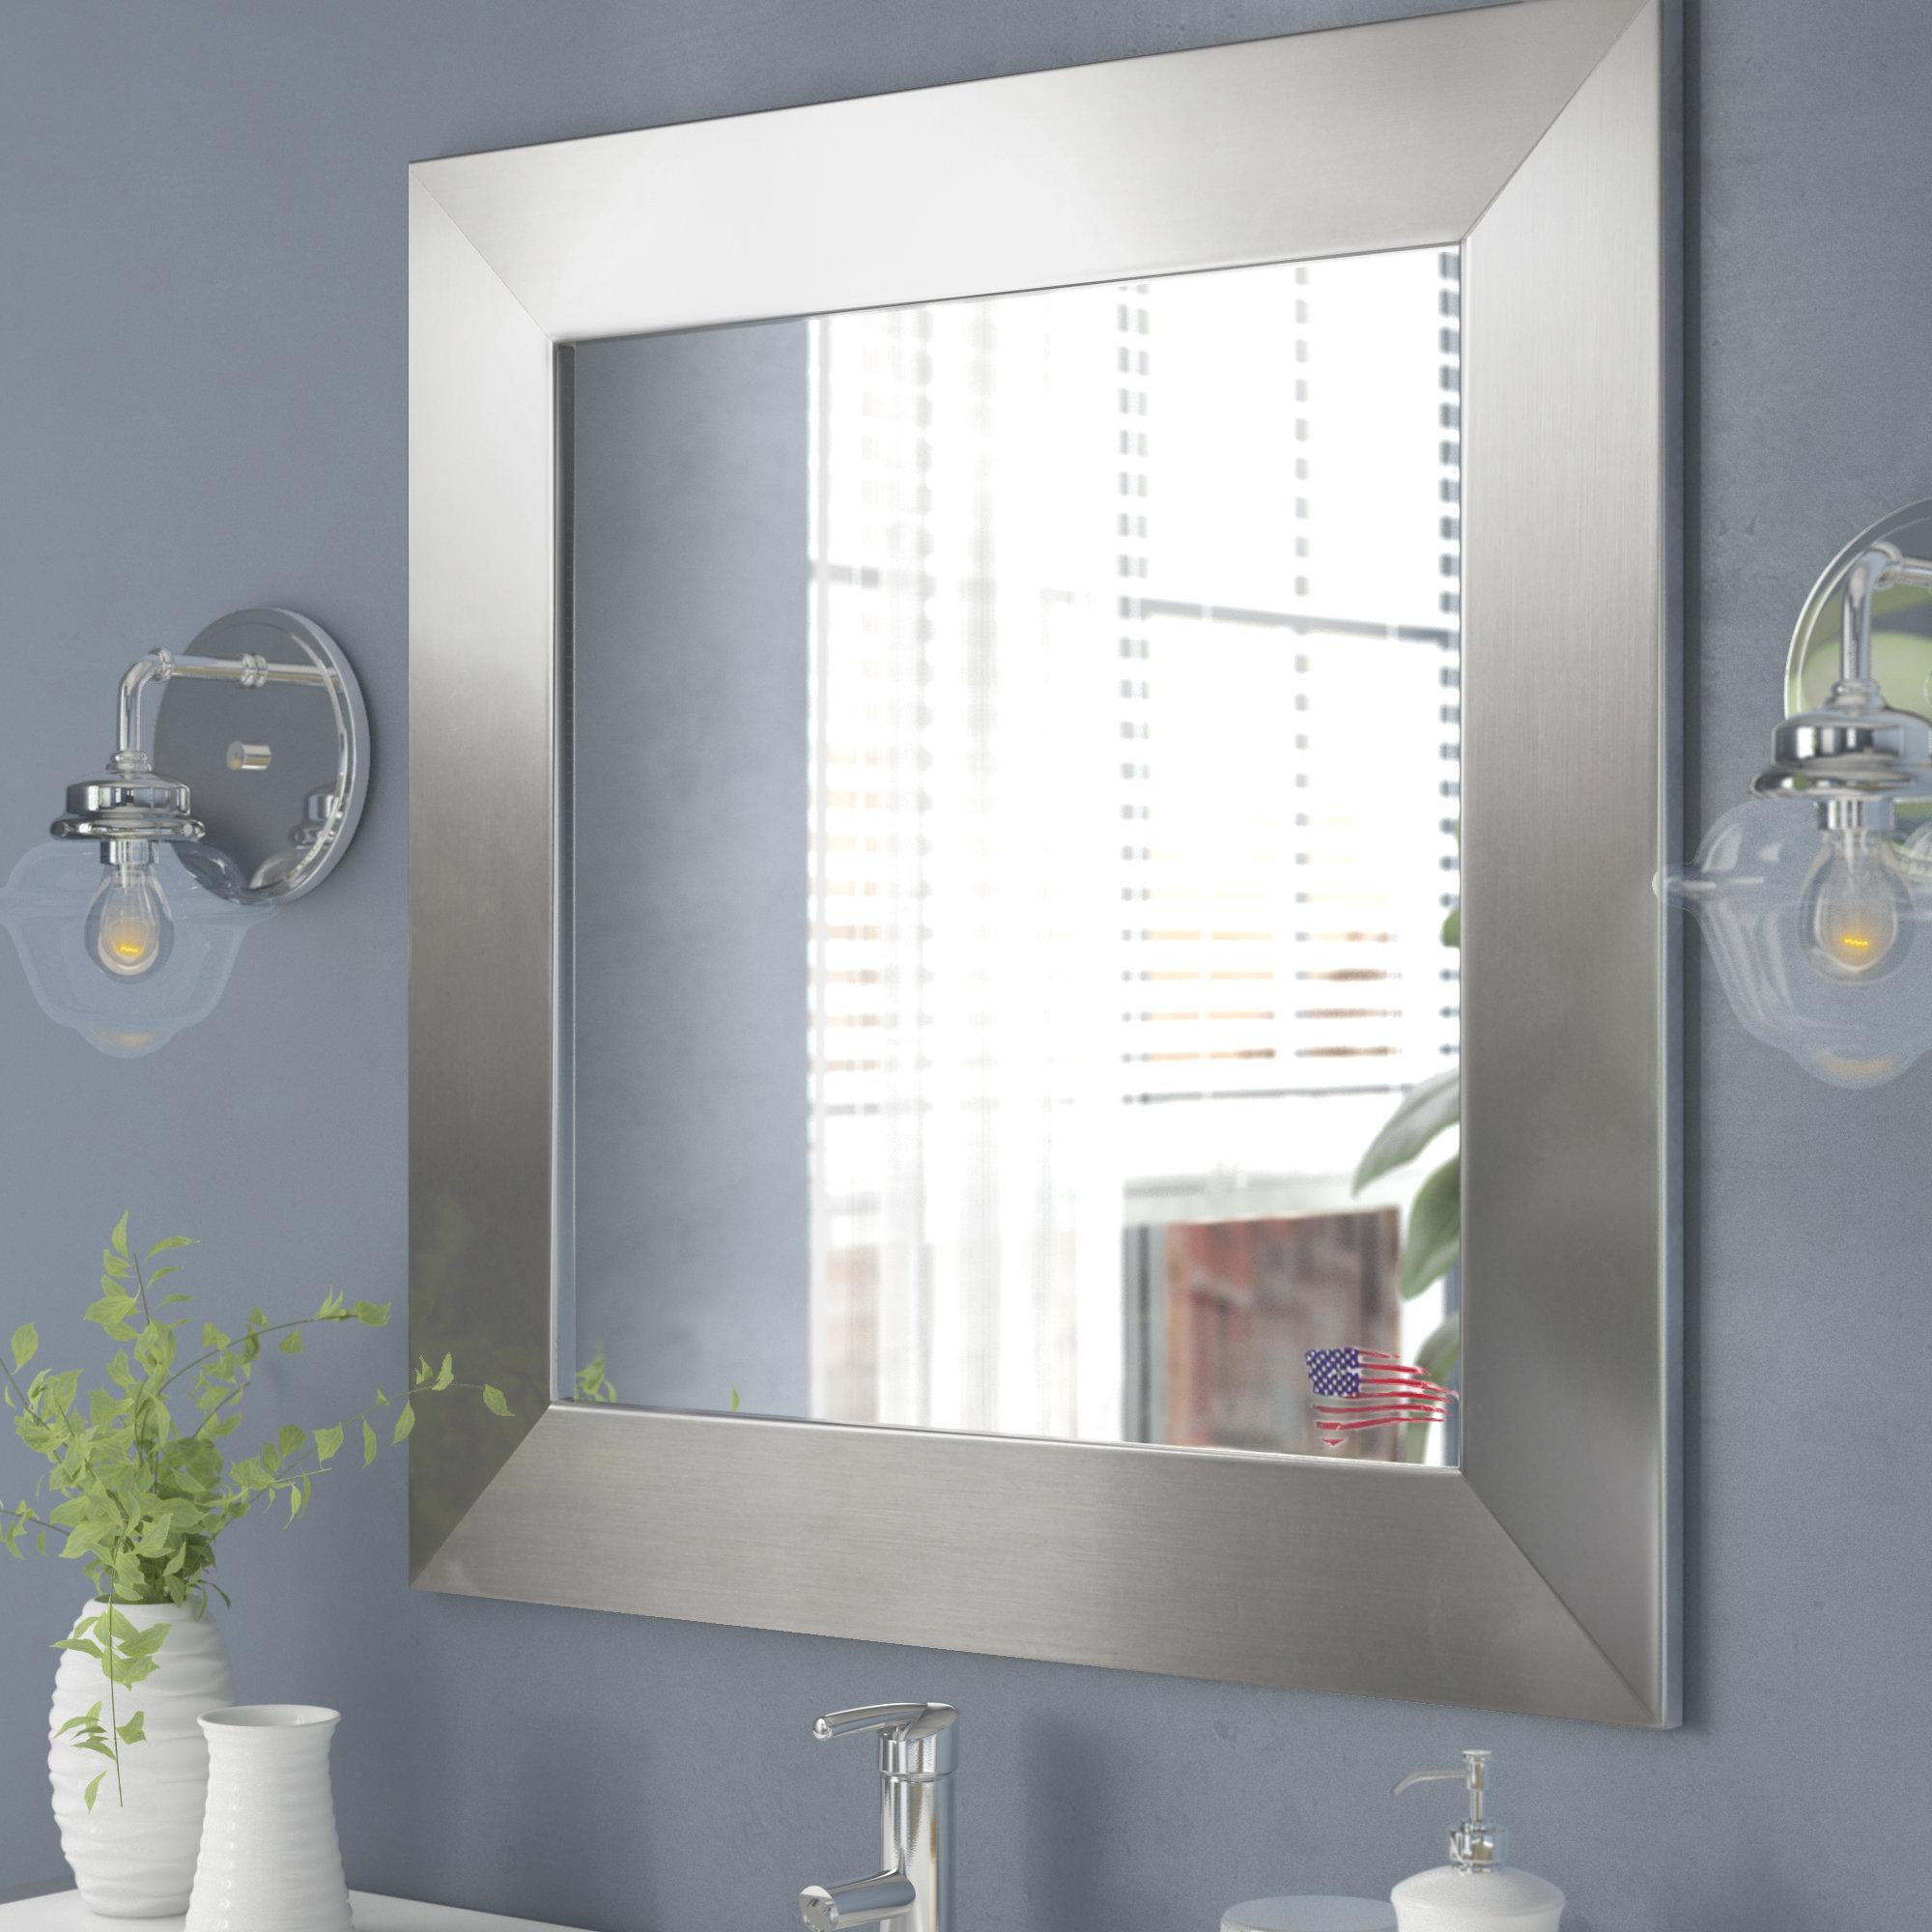 Hammered Nickel Mirror | Wayfair Within Hogge Modern Brushed Nickel Large Frame Wall Mirrors (Image 7 of 20)